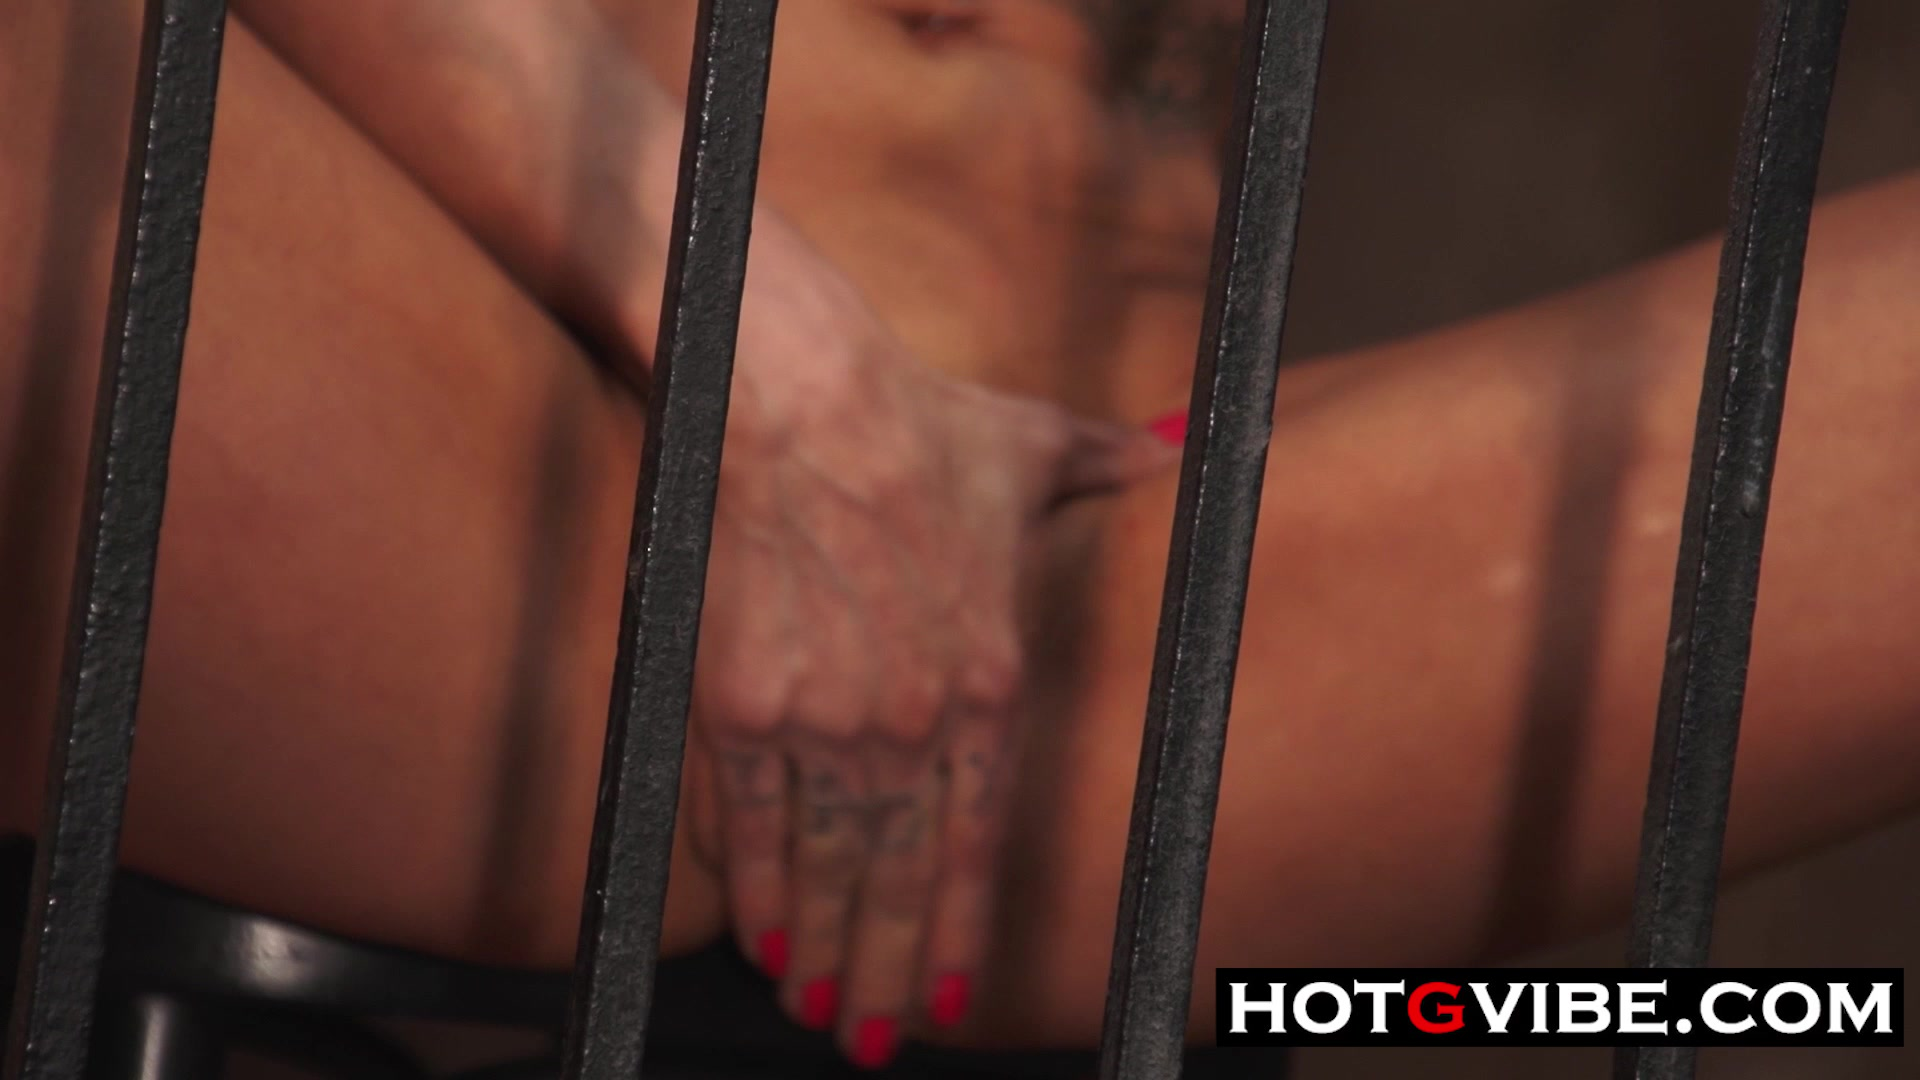 Porn hd Asian anal